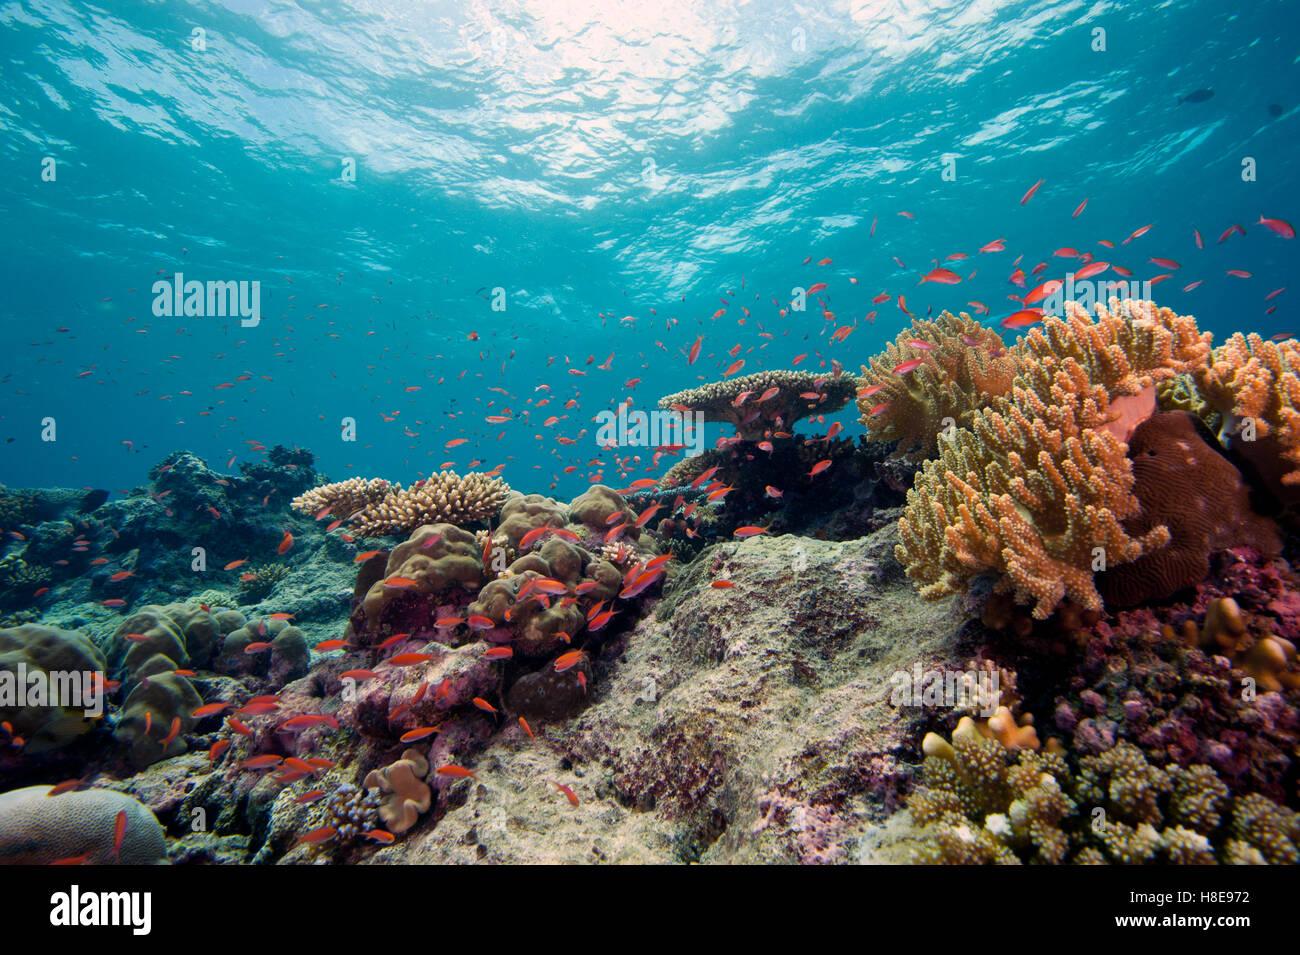 Healthy coral reef underwater - Stock Image